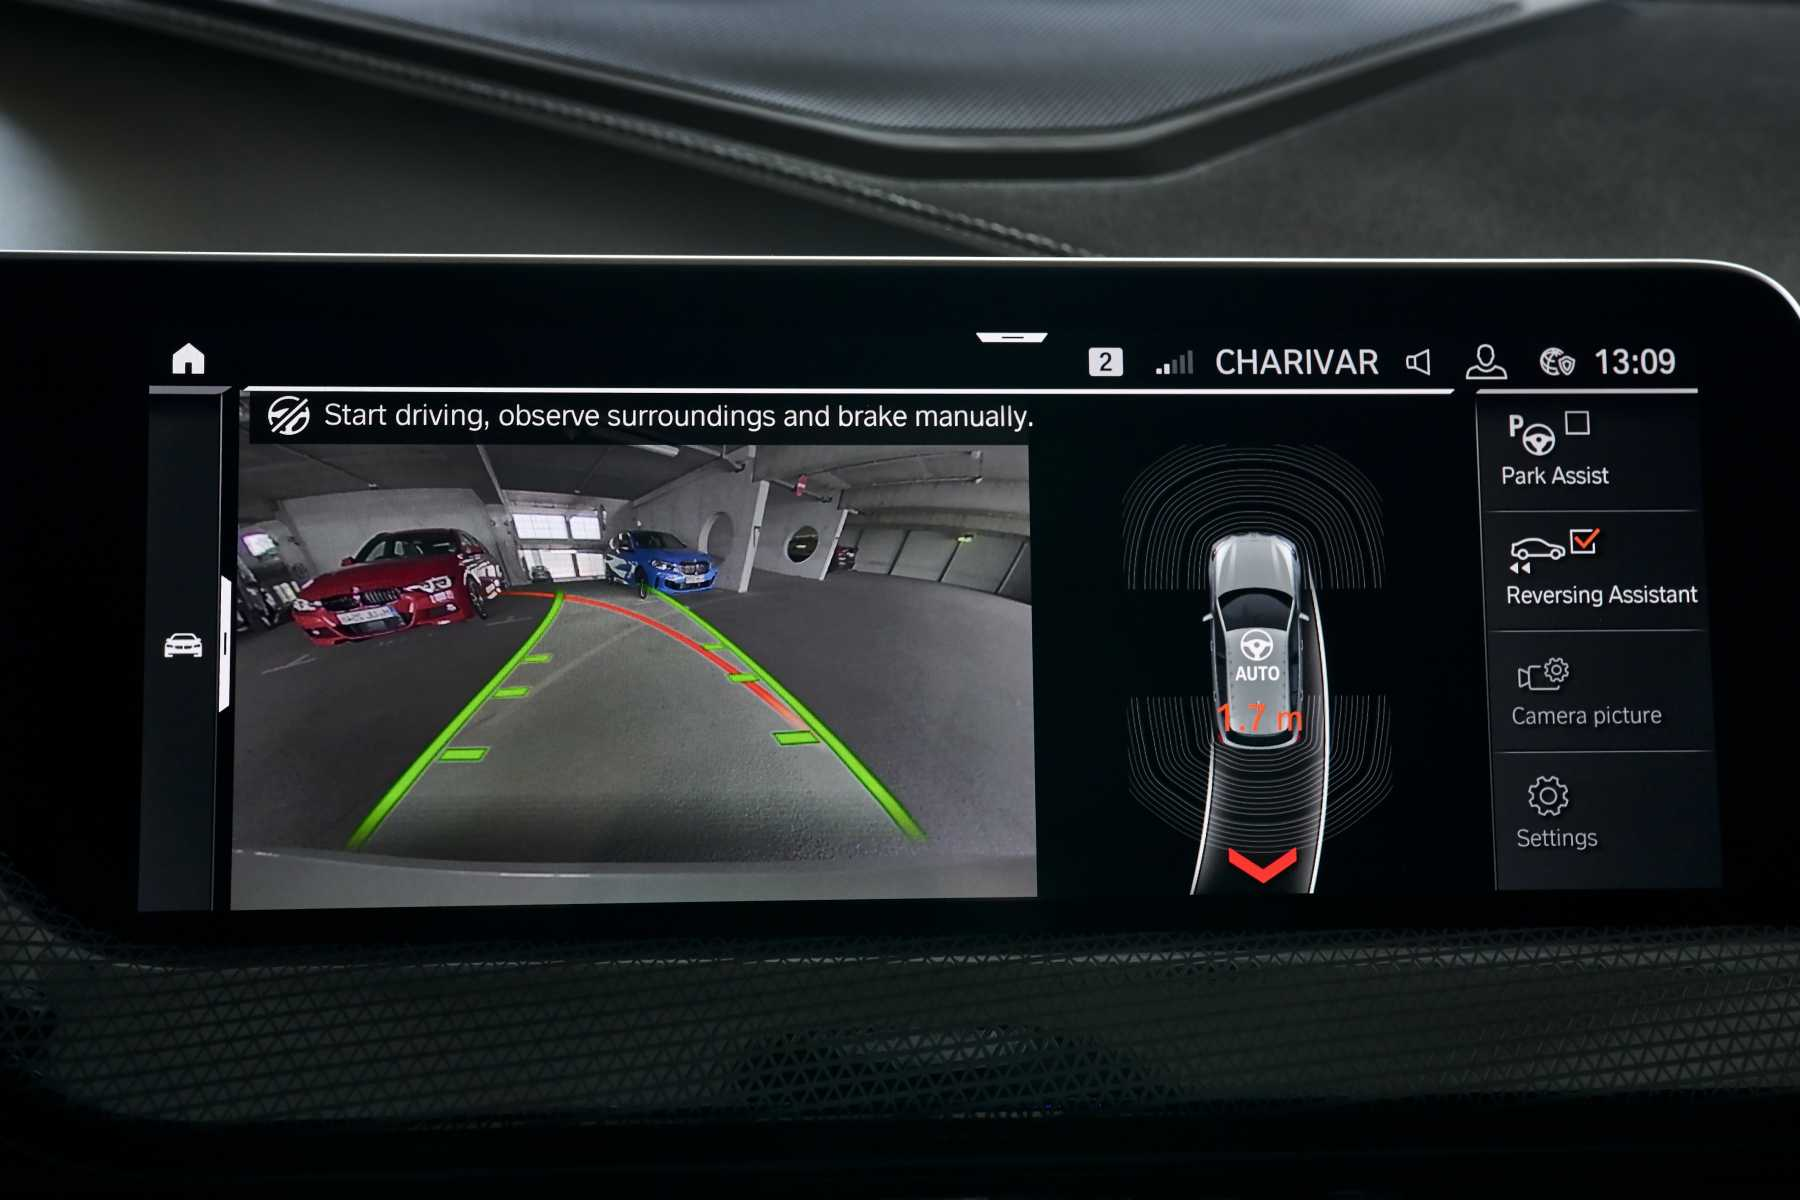 BMW 1 Series Parking Assistant